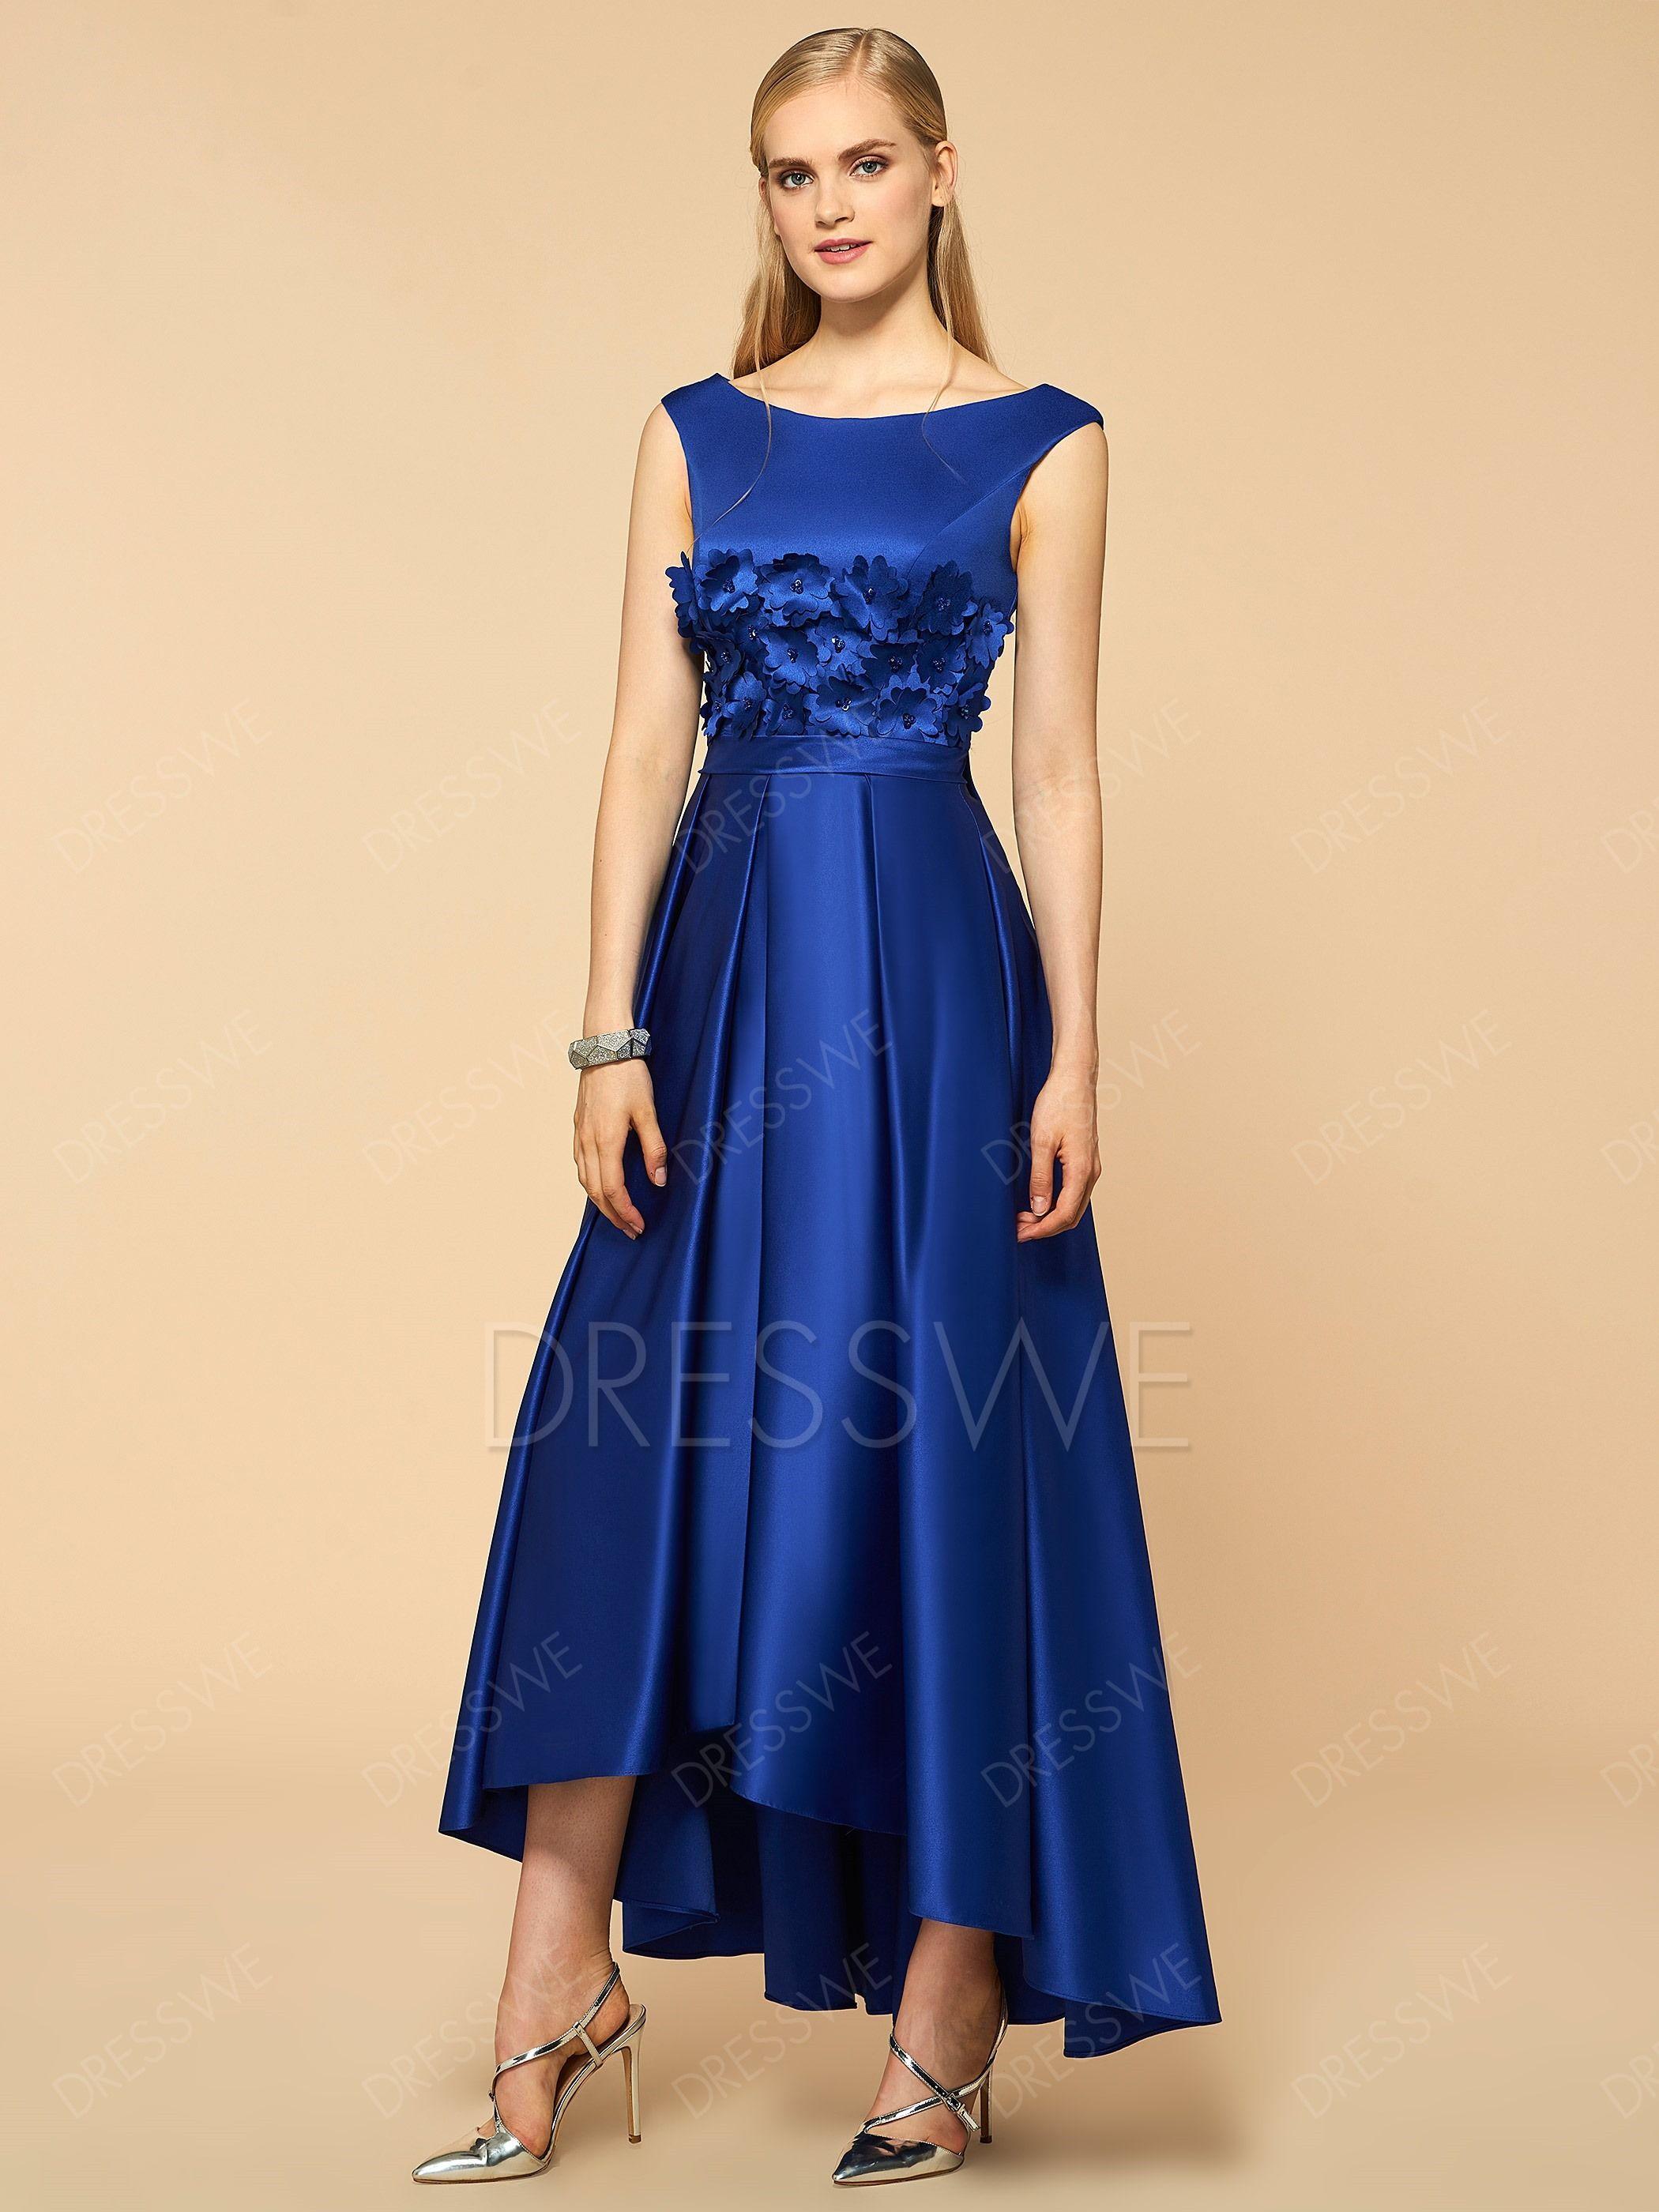 dresswe supplies scoop flower high low bridesmaid dress